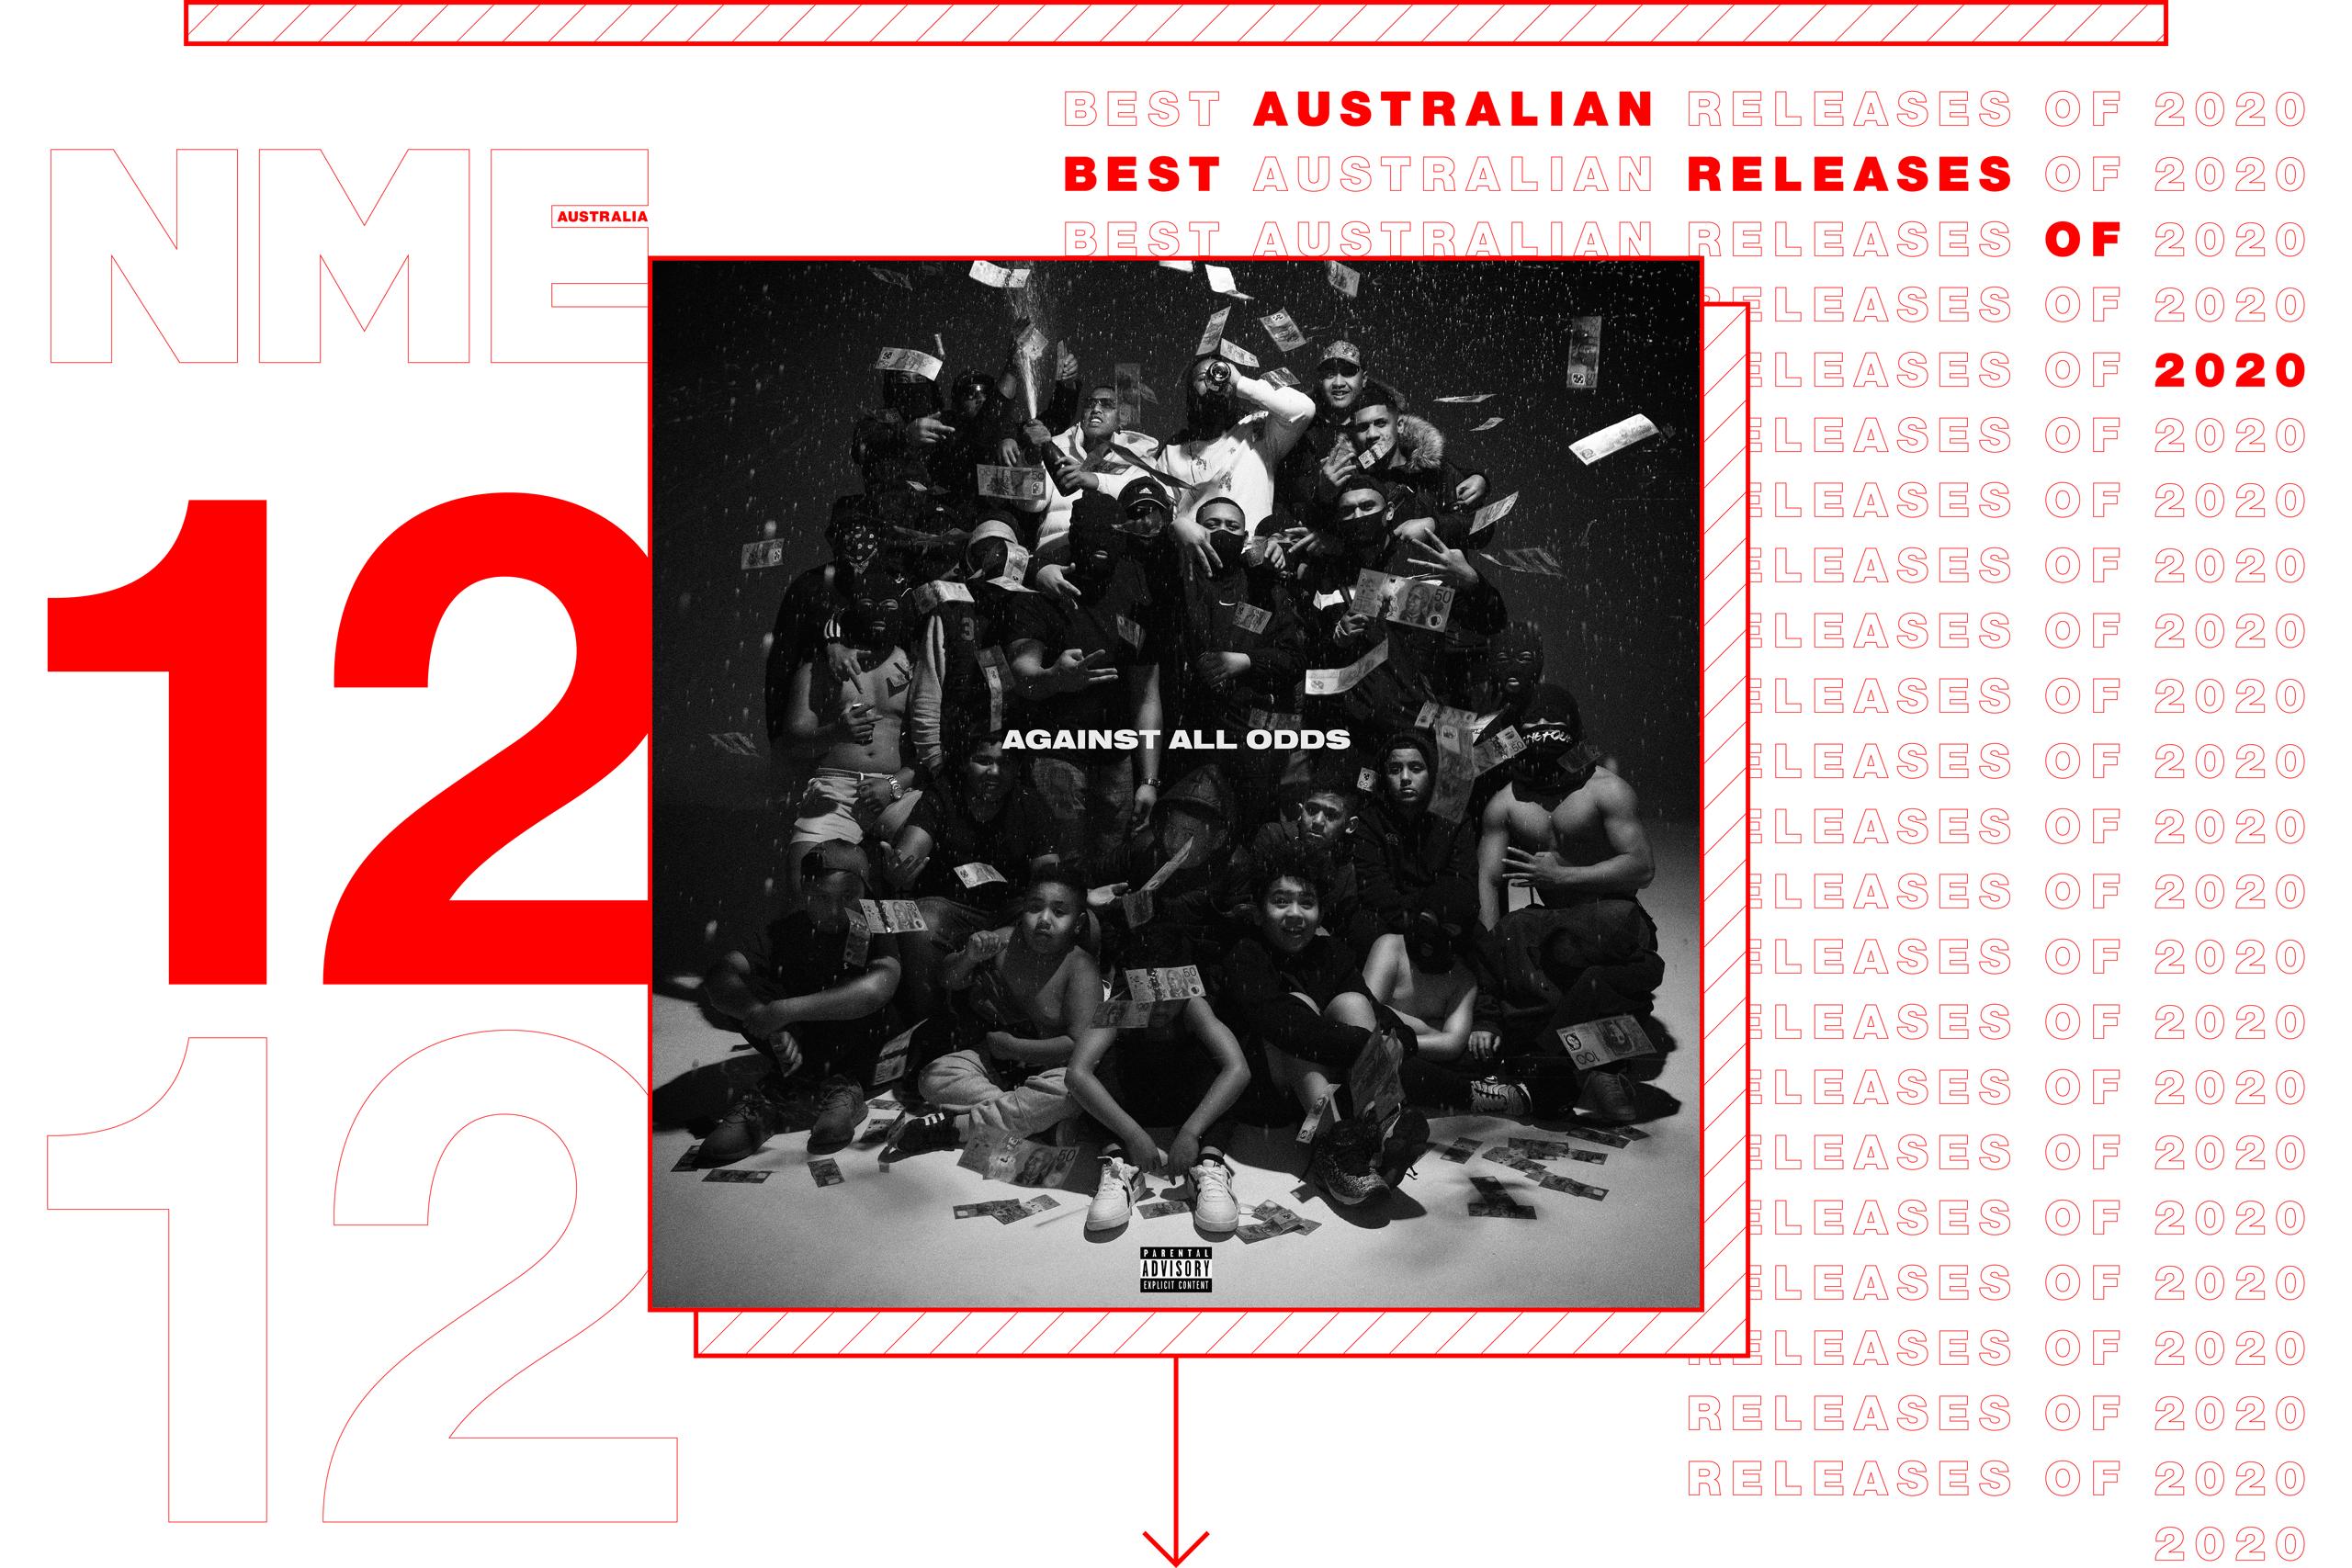 NME Australian Album Release 12